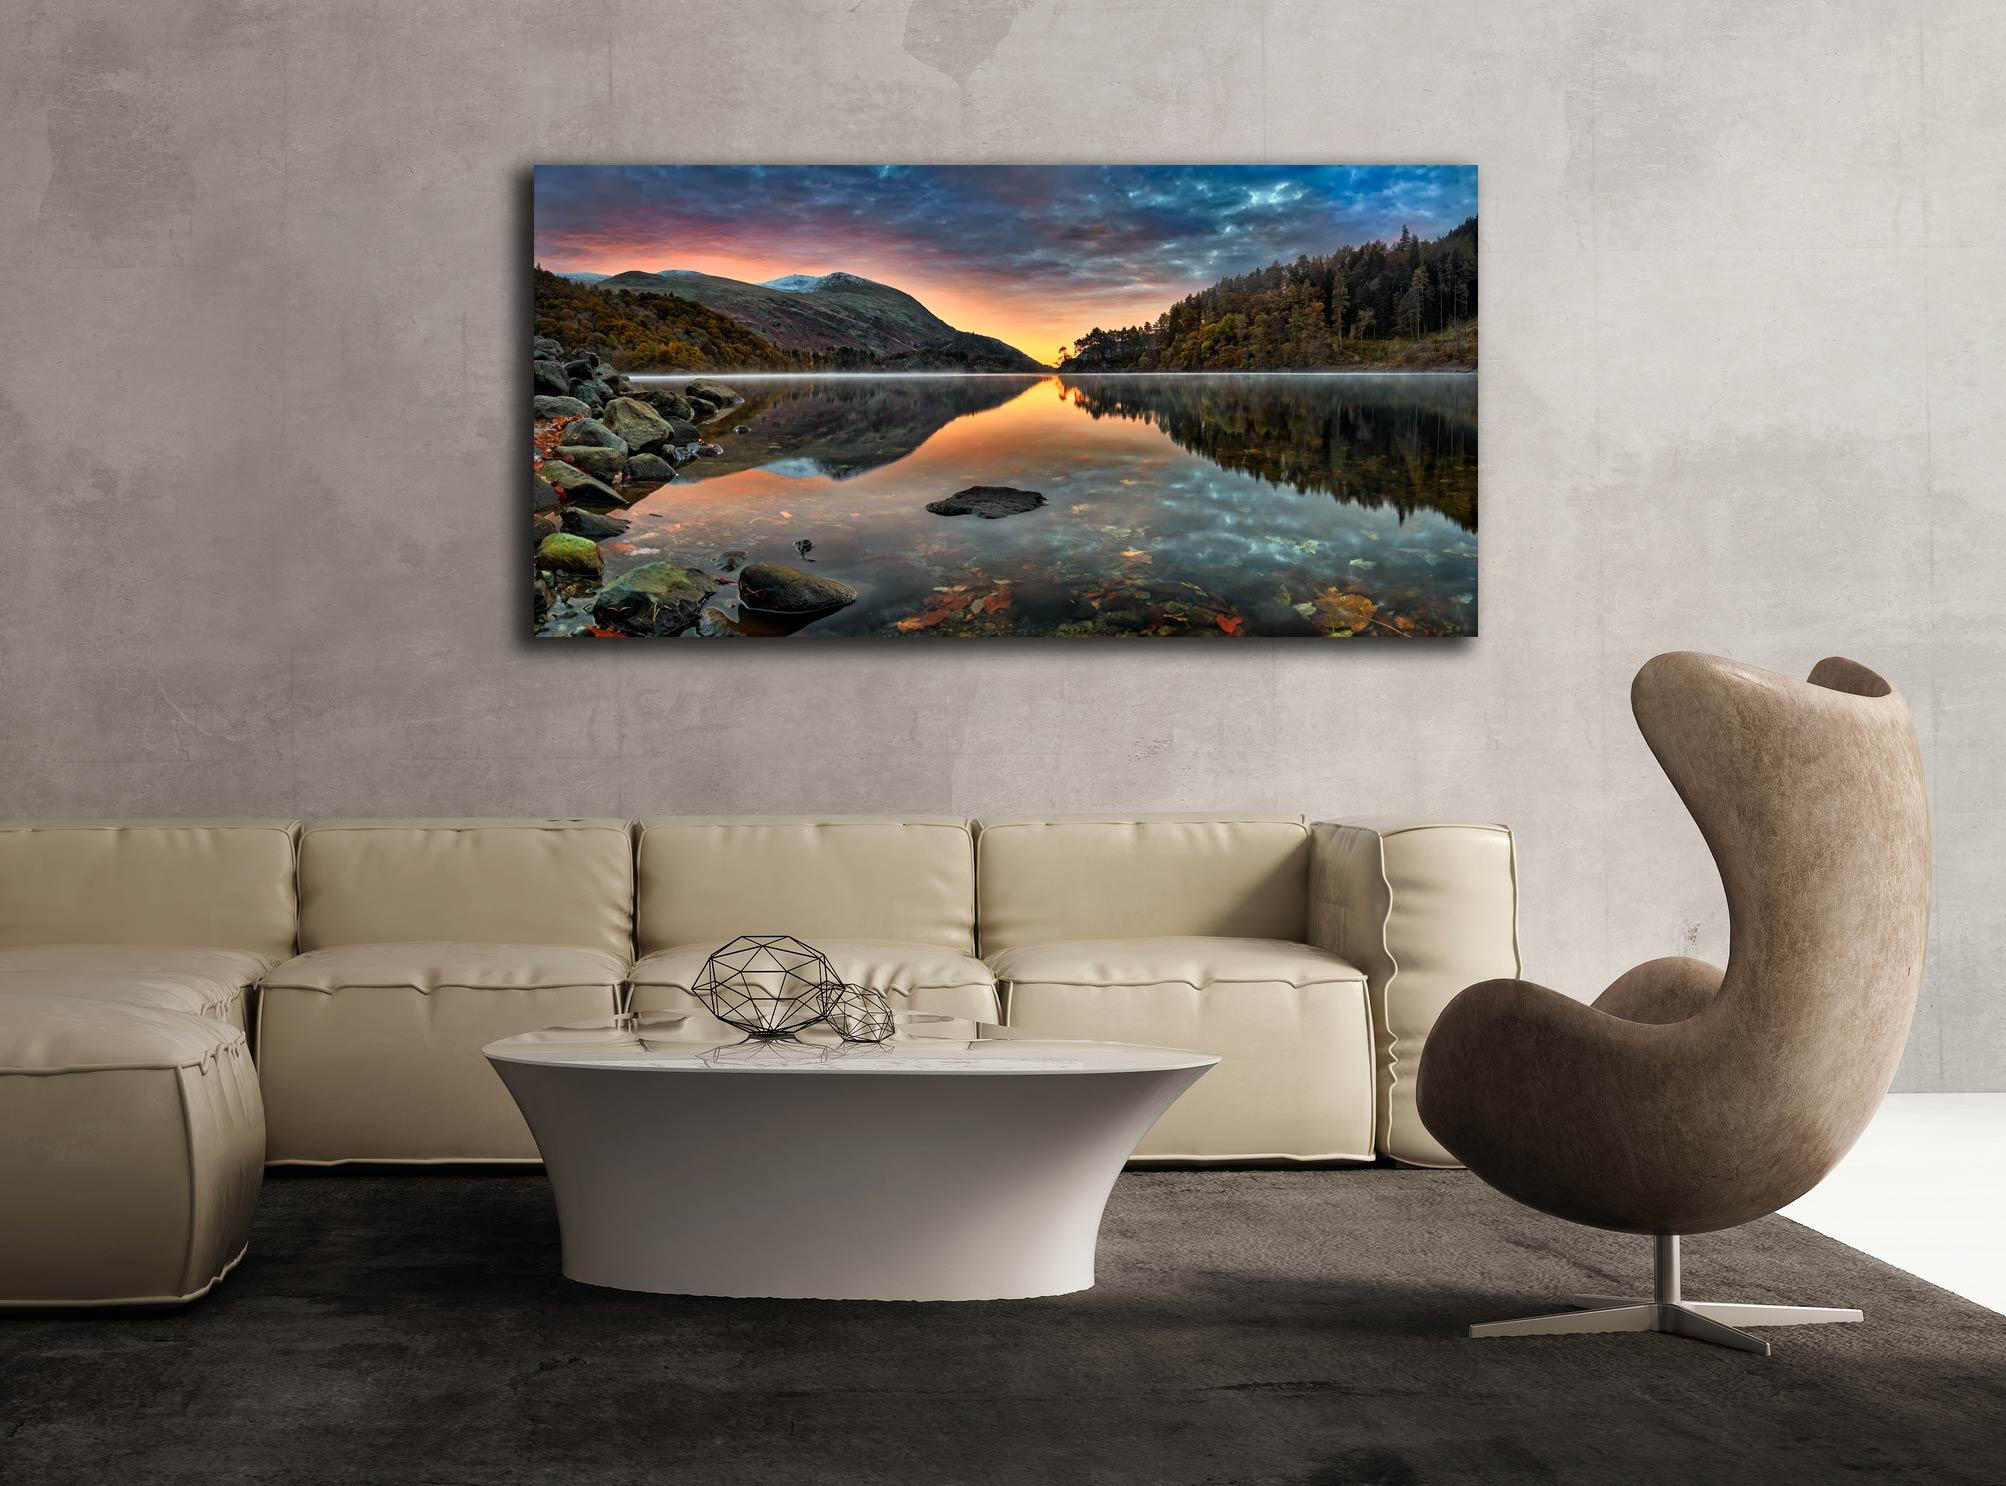 Thirlmere Autumn Dawn - Print Aluminium Backing With Acrylic Glazing on Wall